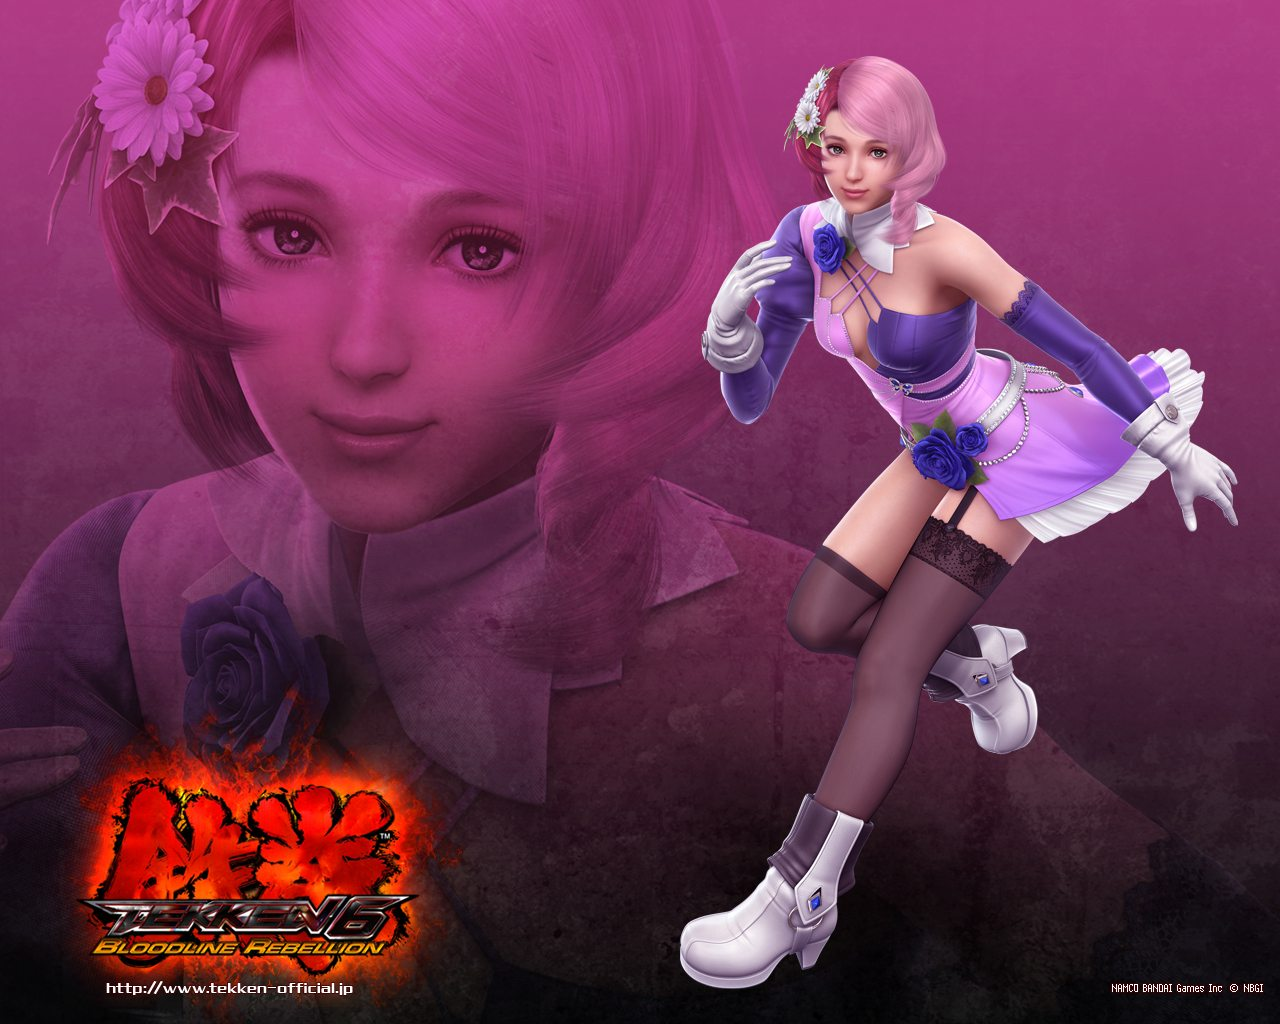 Free Download Alisa Tekken 6 Wallpaper Gamebud 1280x1024